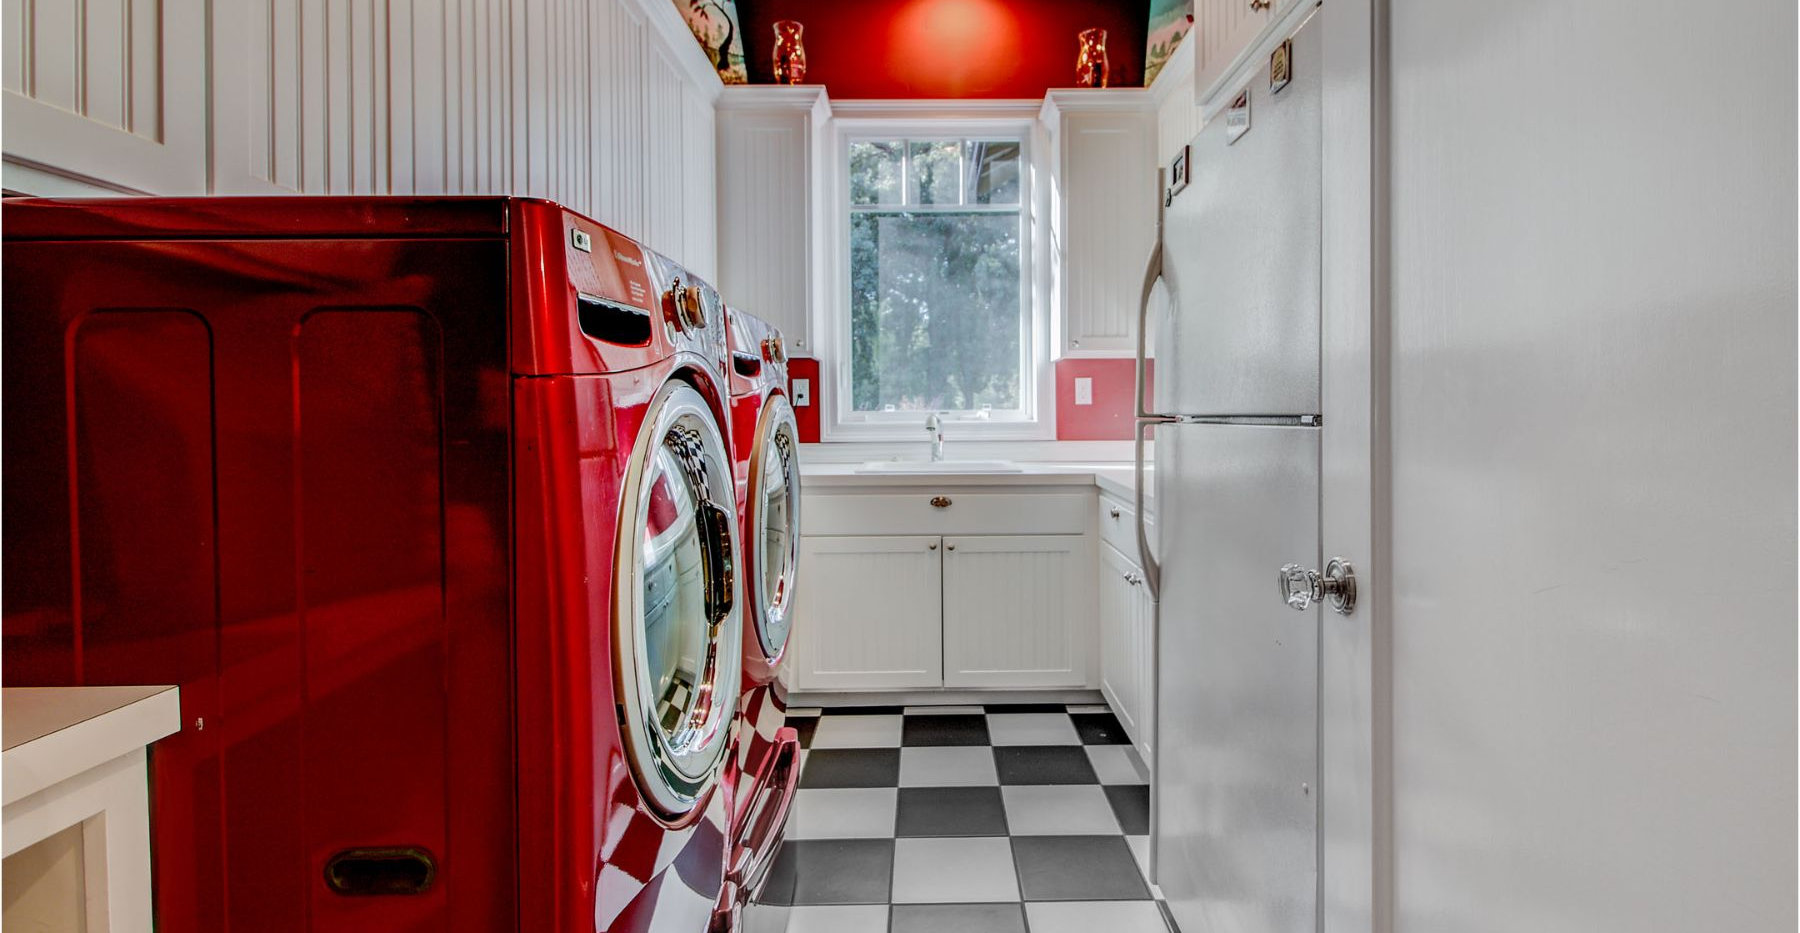 32 Laundry.jpg